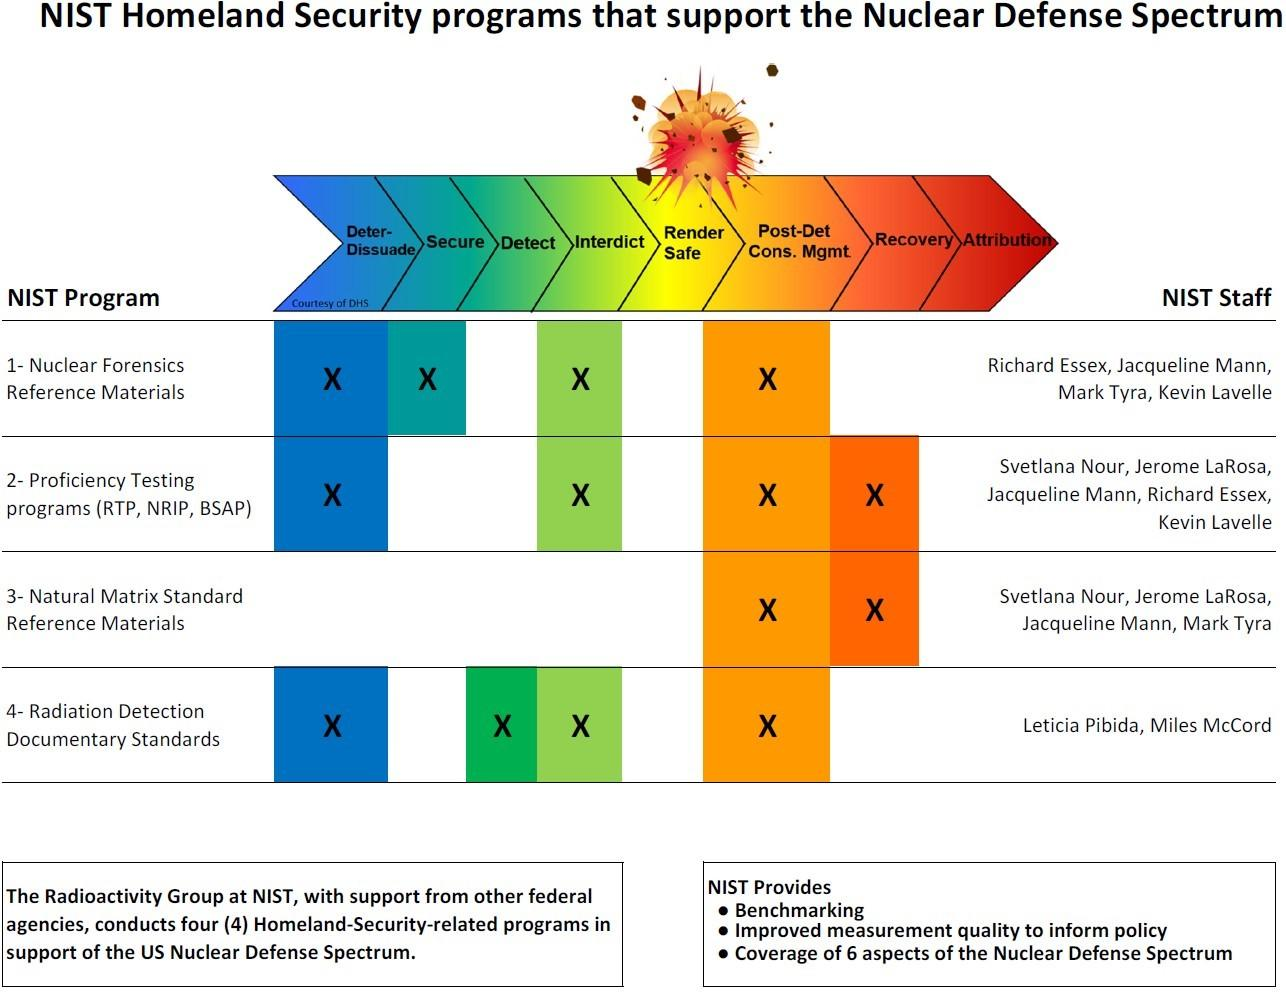 nuclear defense spectrum